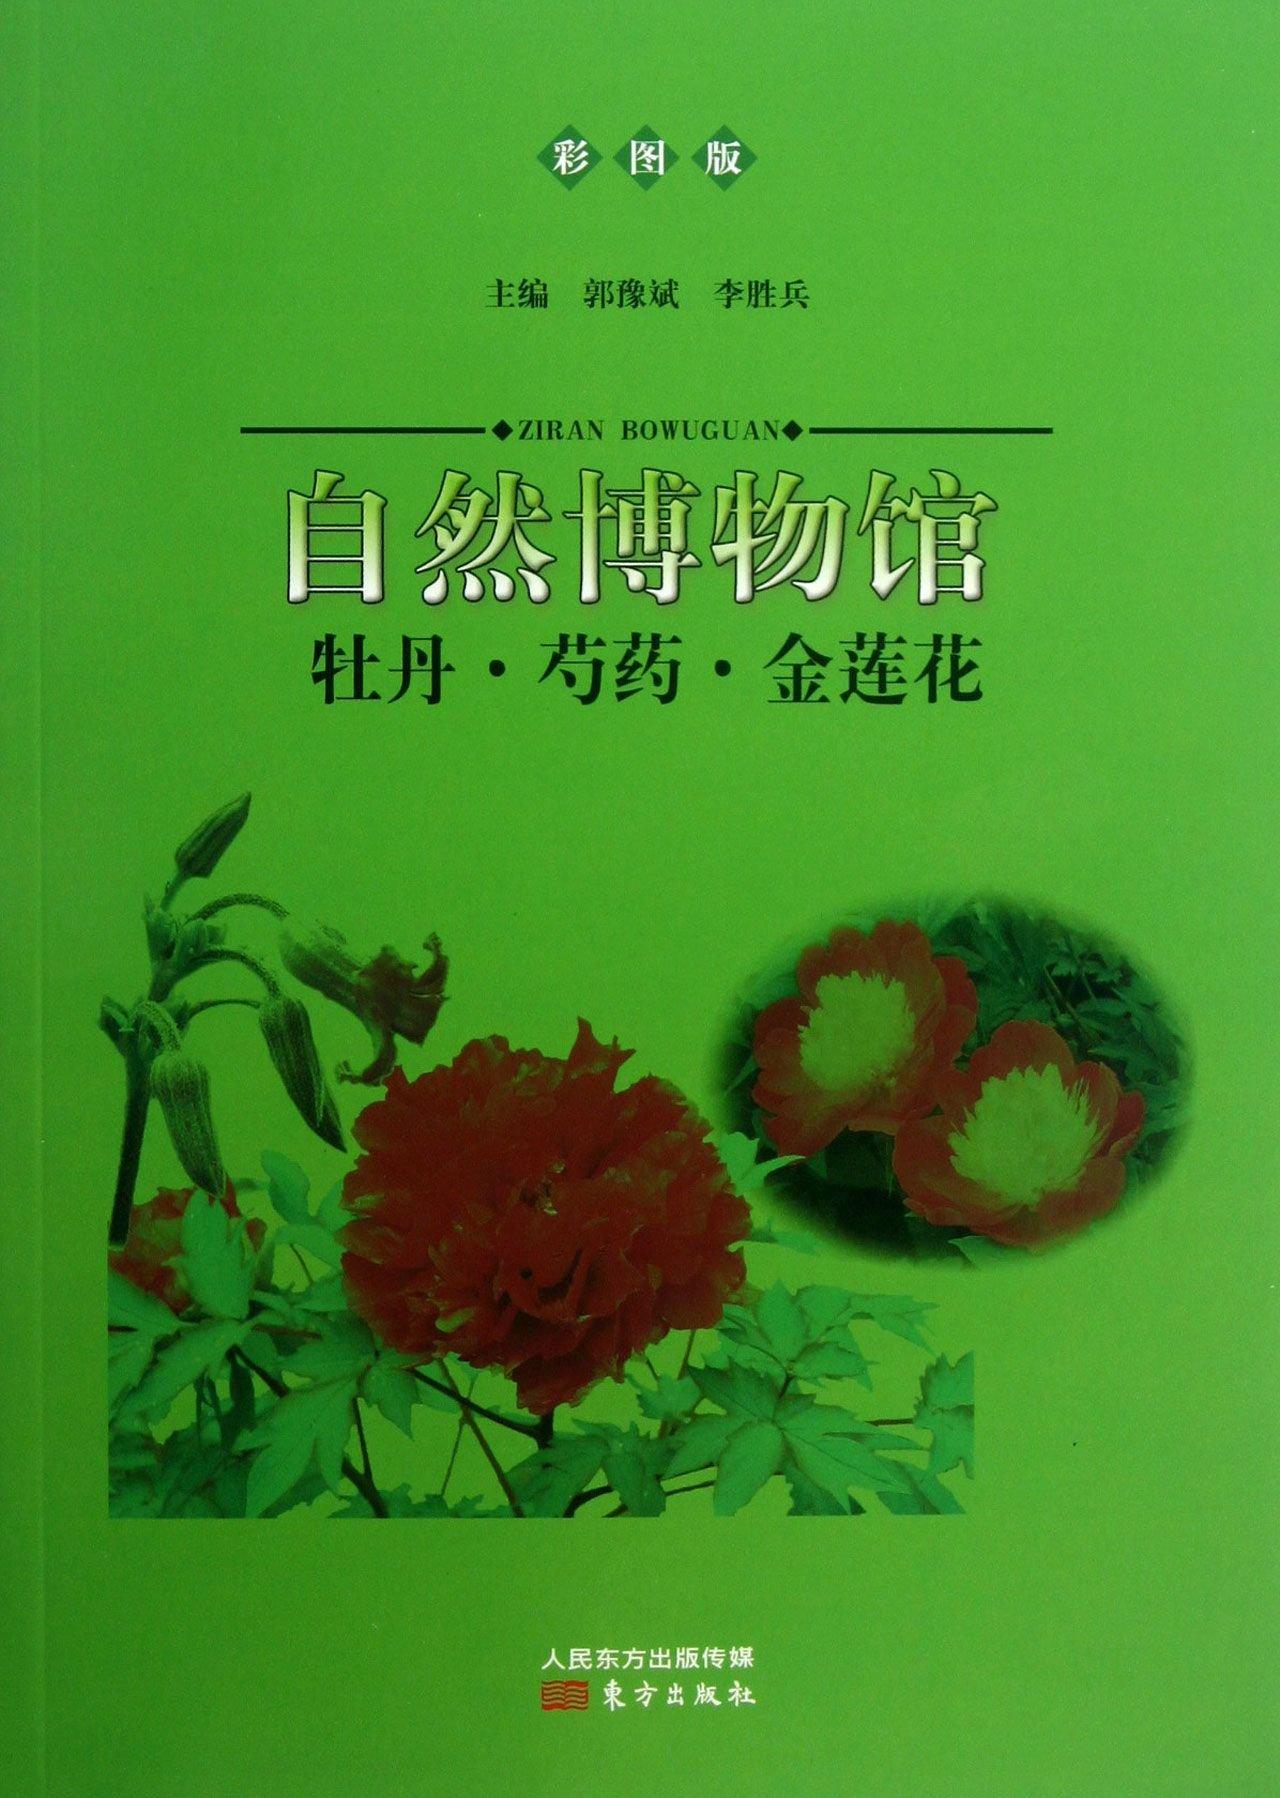 Download Natural History Museum : Peony Paeonia nasturtium ( color version )(Chinese Edition) PDF